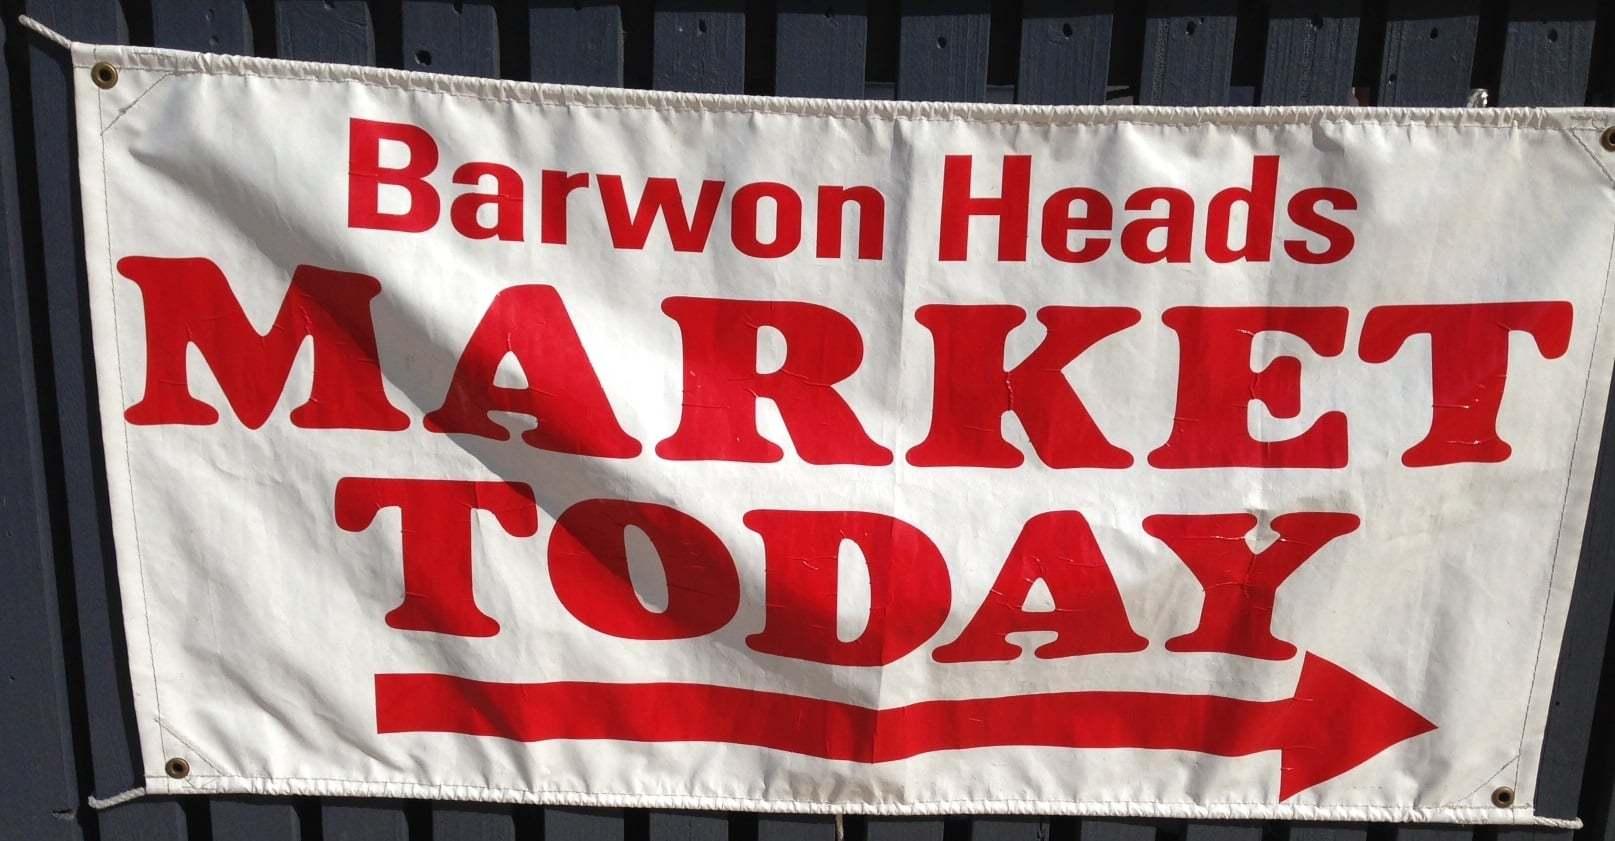 Barwon Heads market.